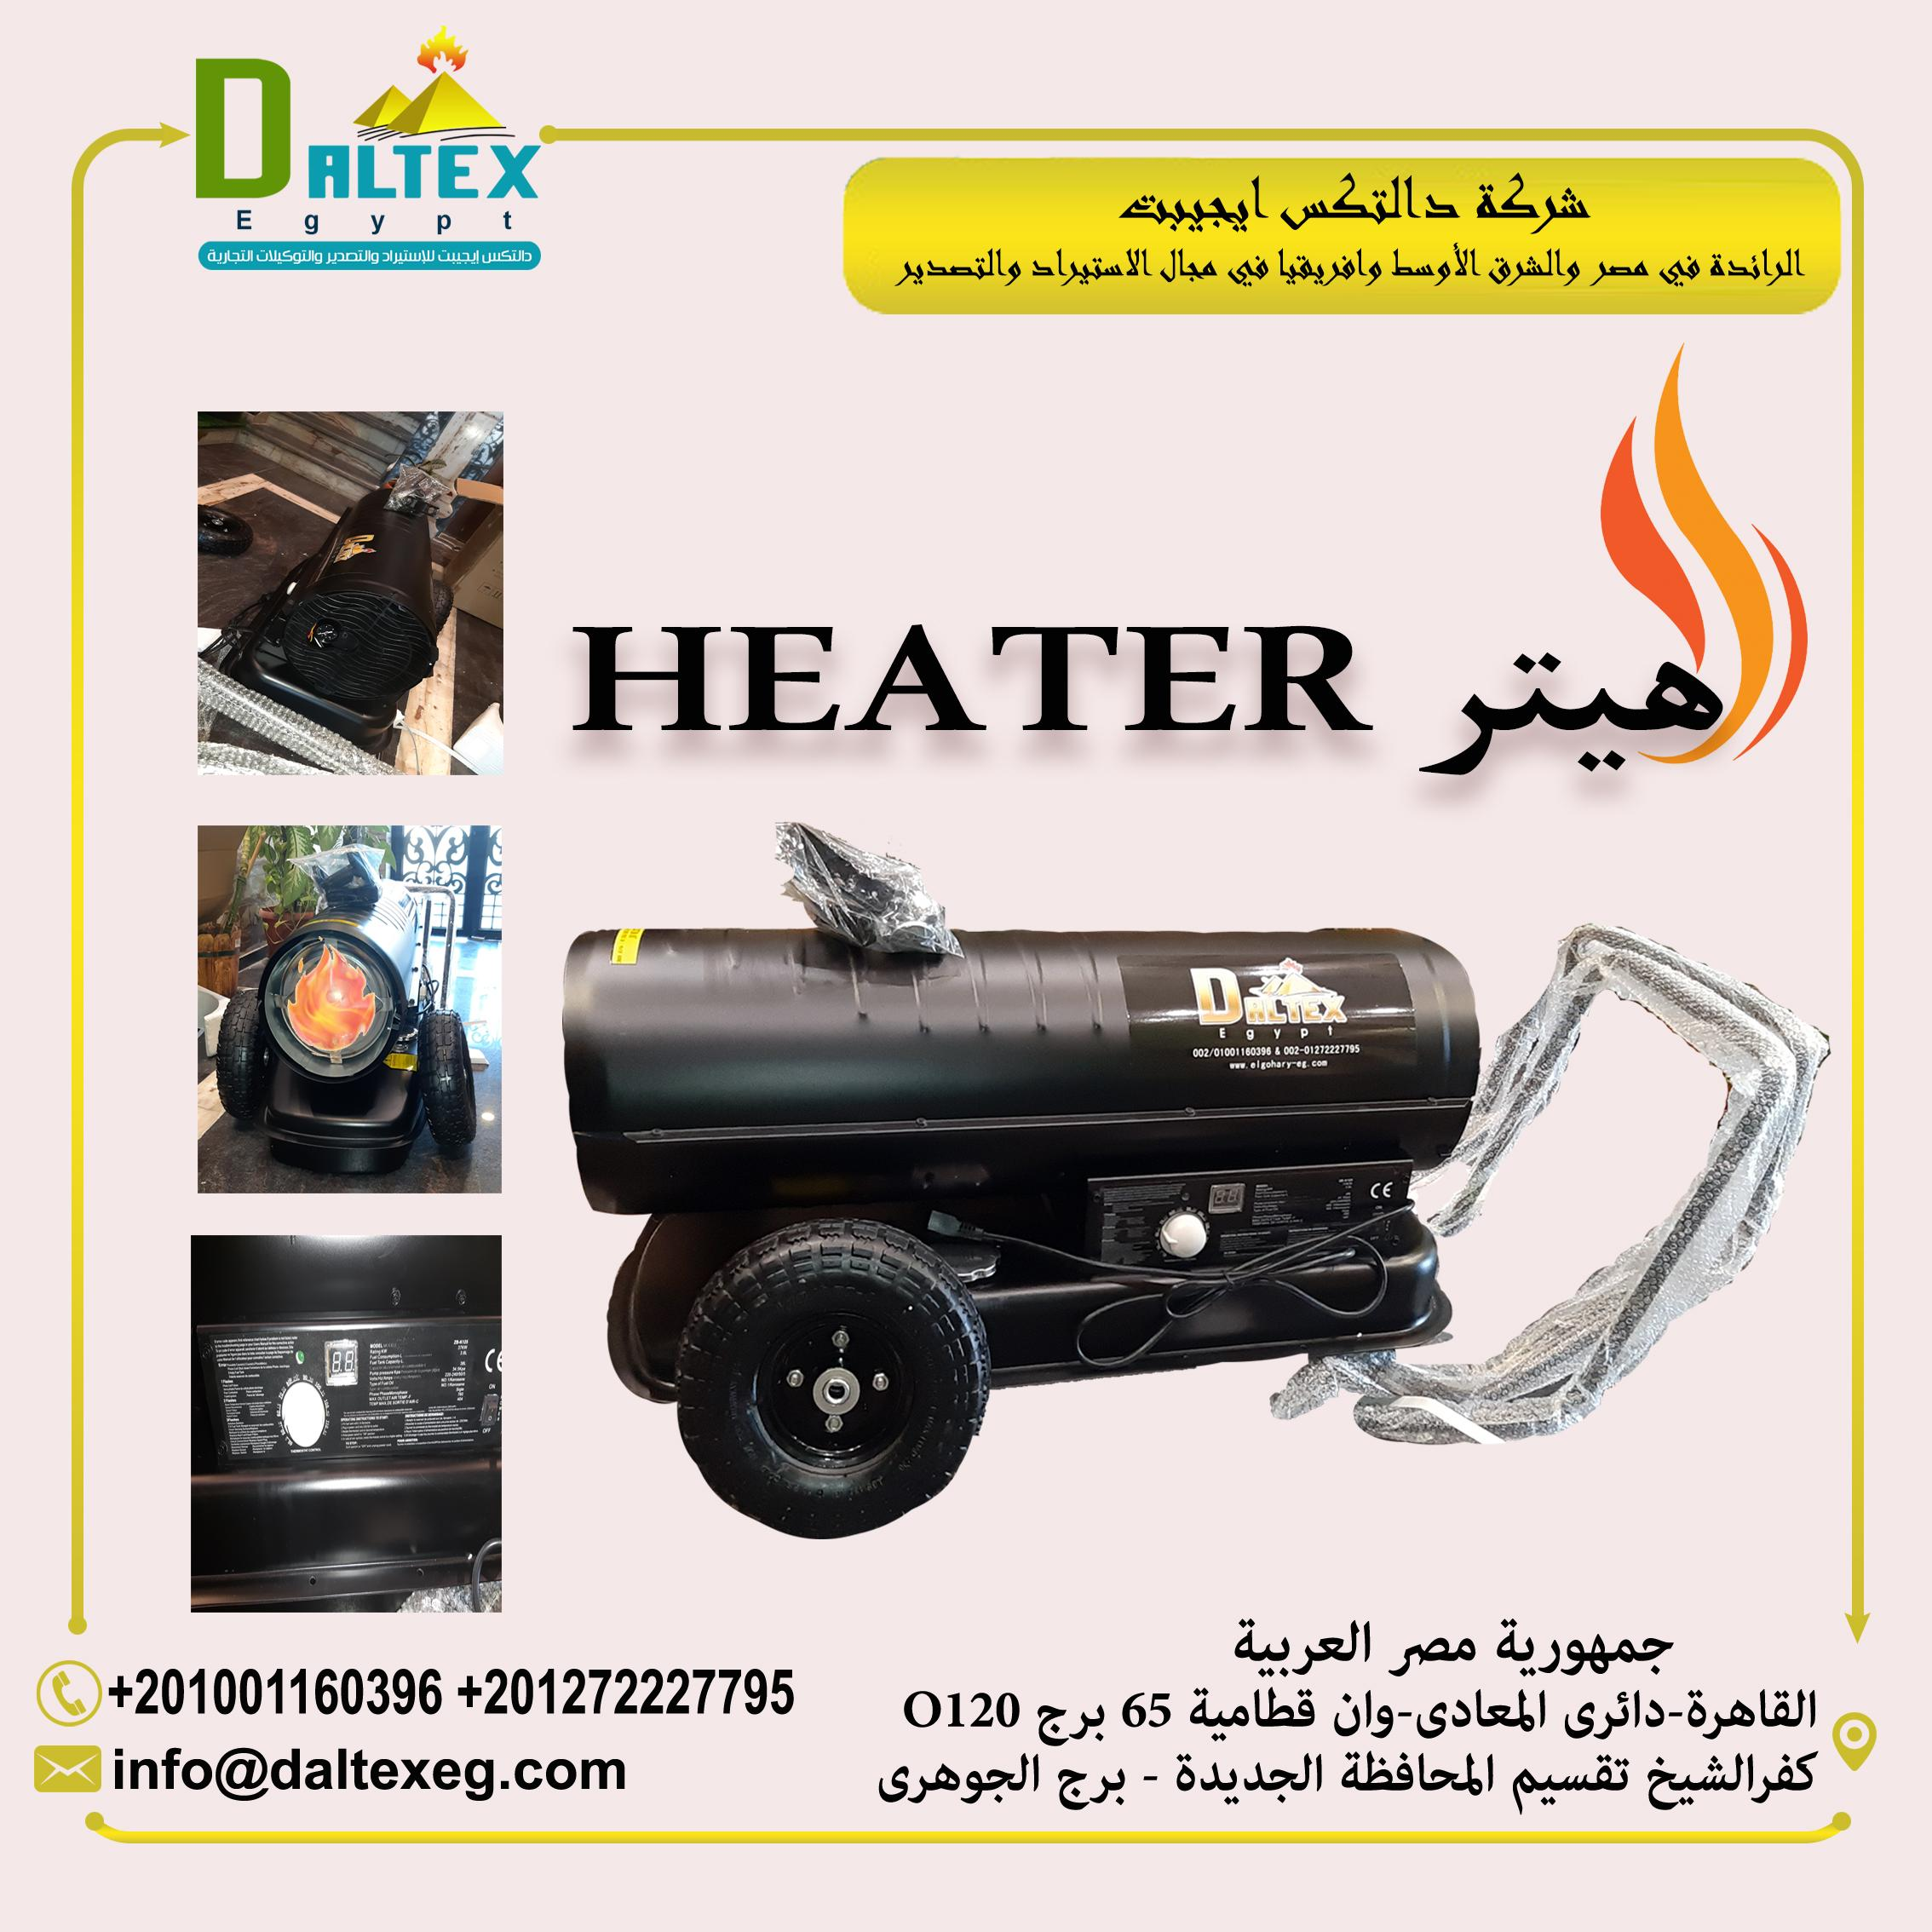 Heater لتدفئه مزارع الدواجن والارانب وغيرها